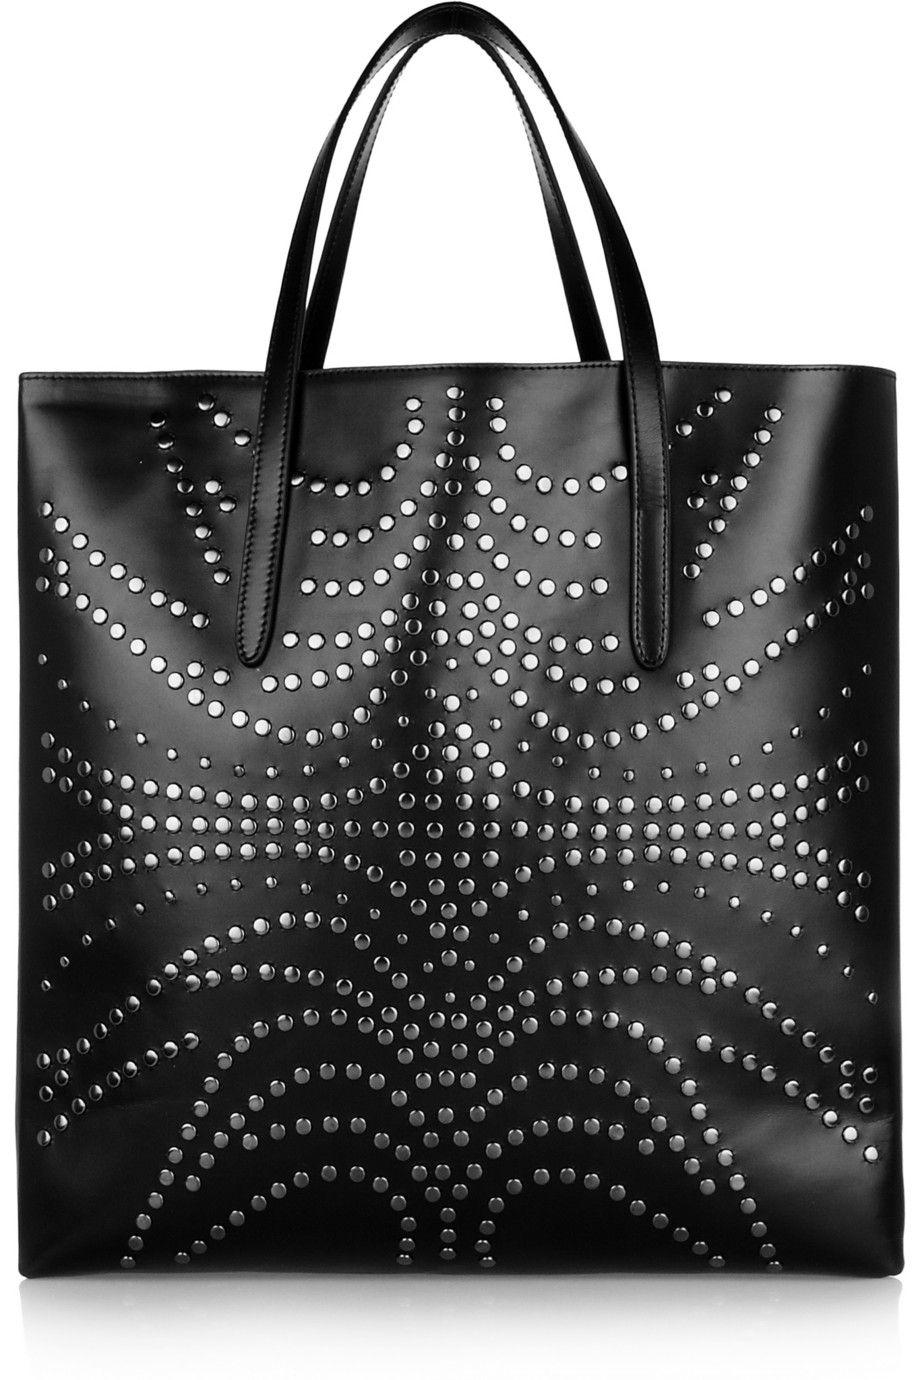 Alaïa - Studded leather tote